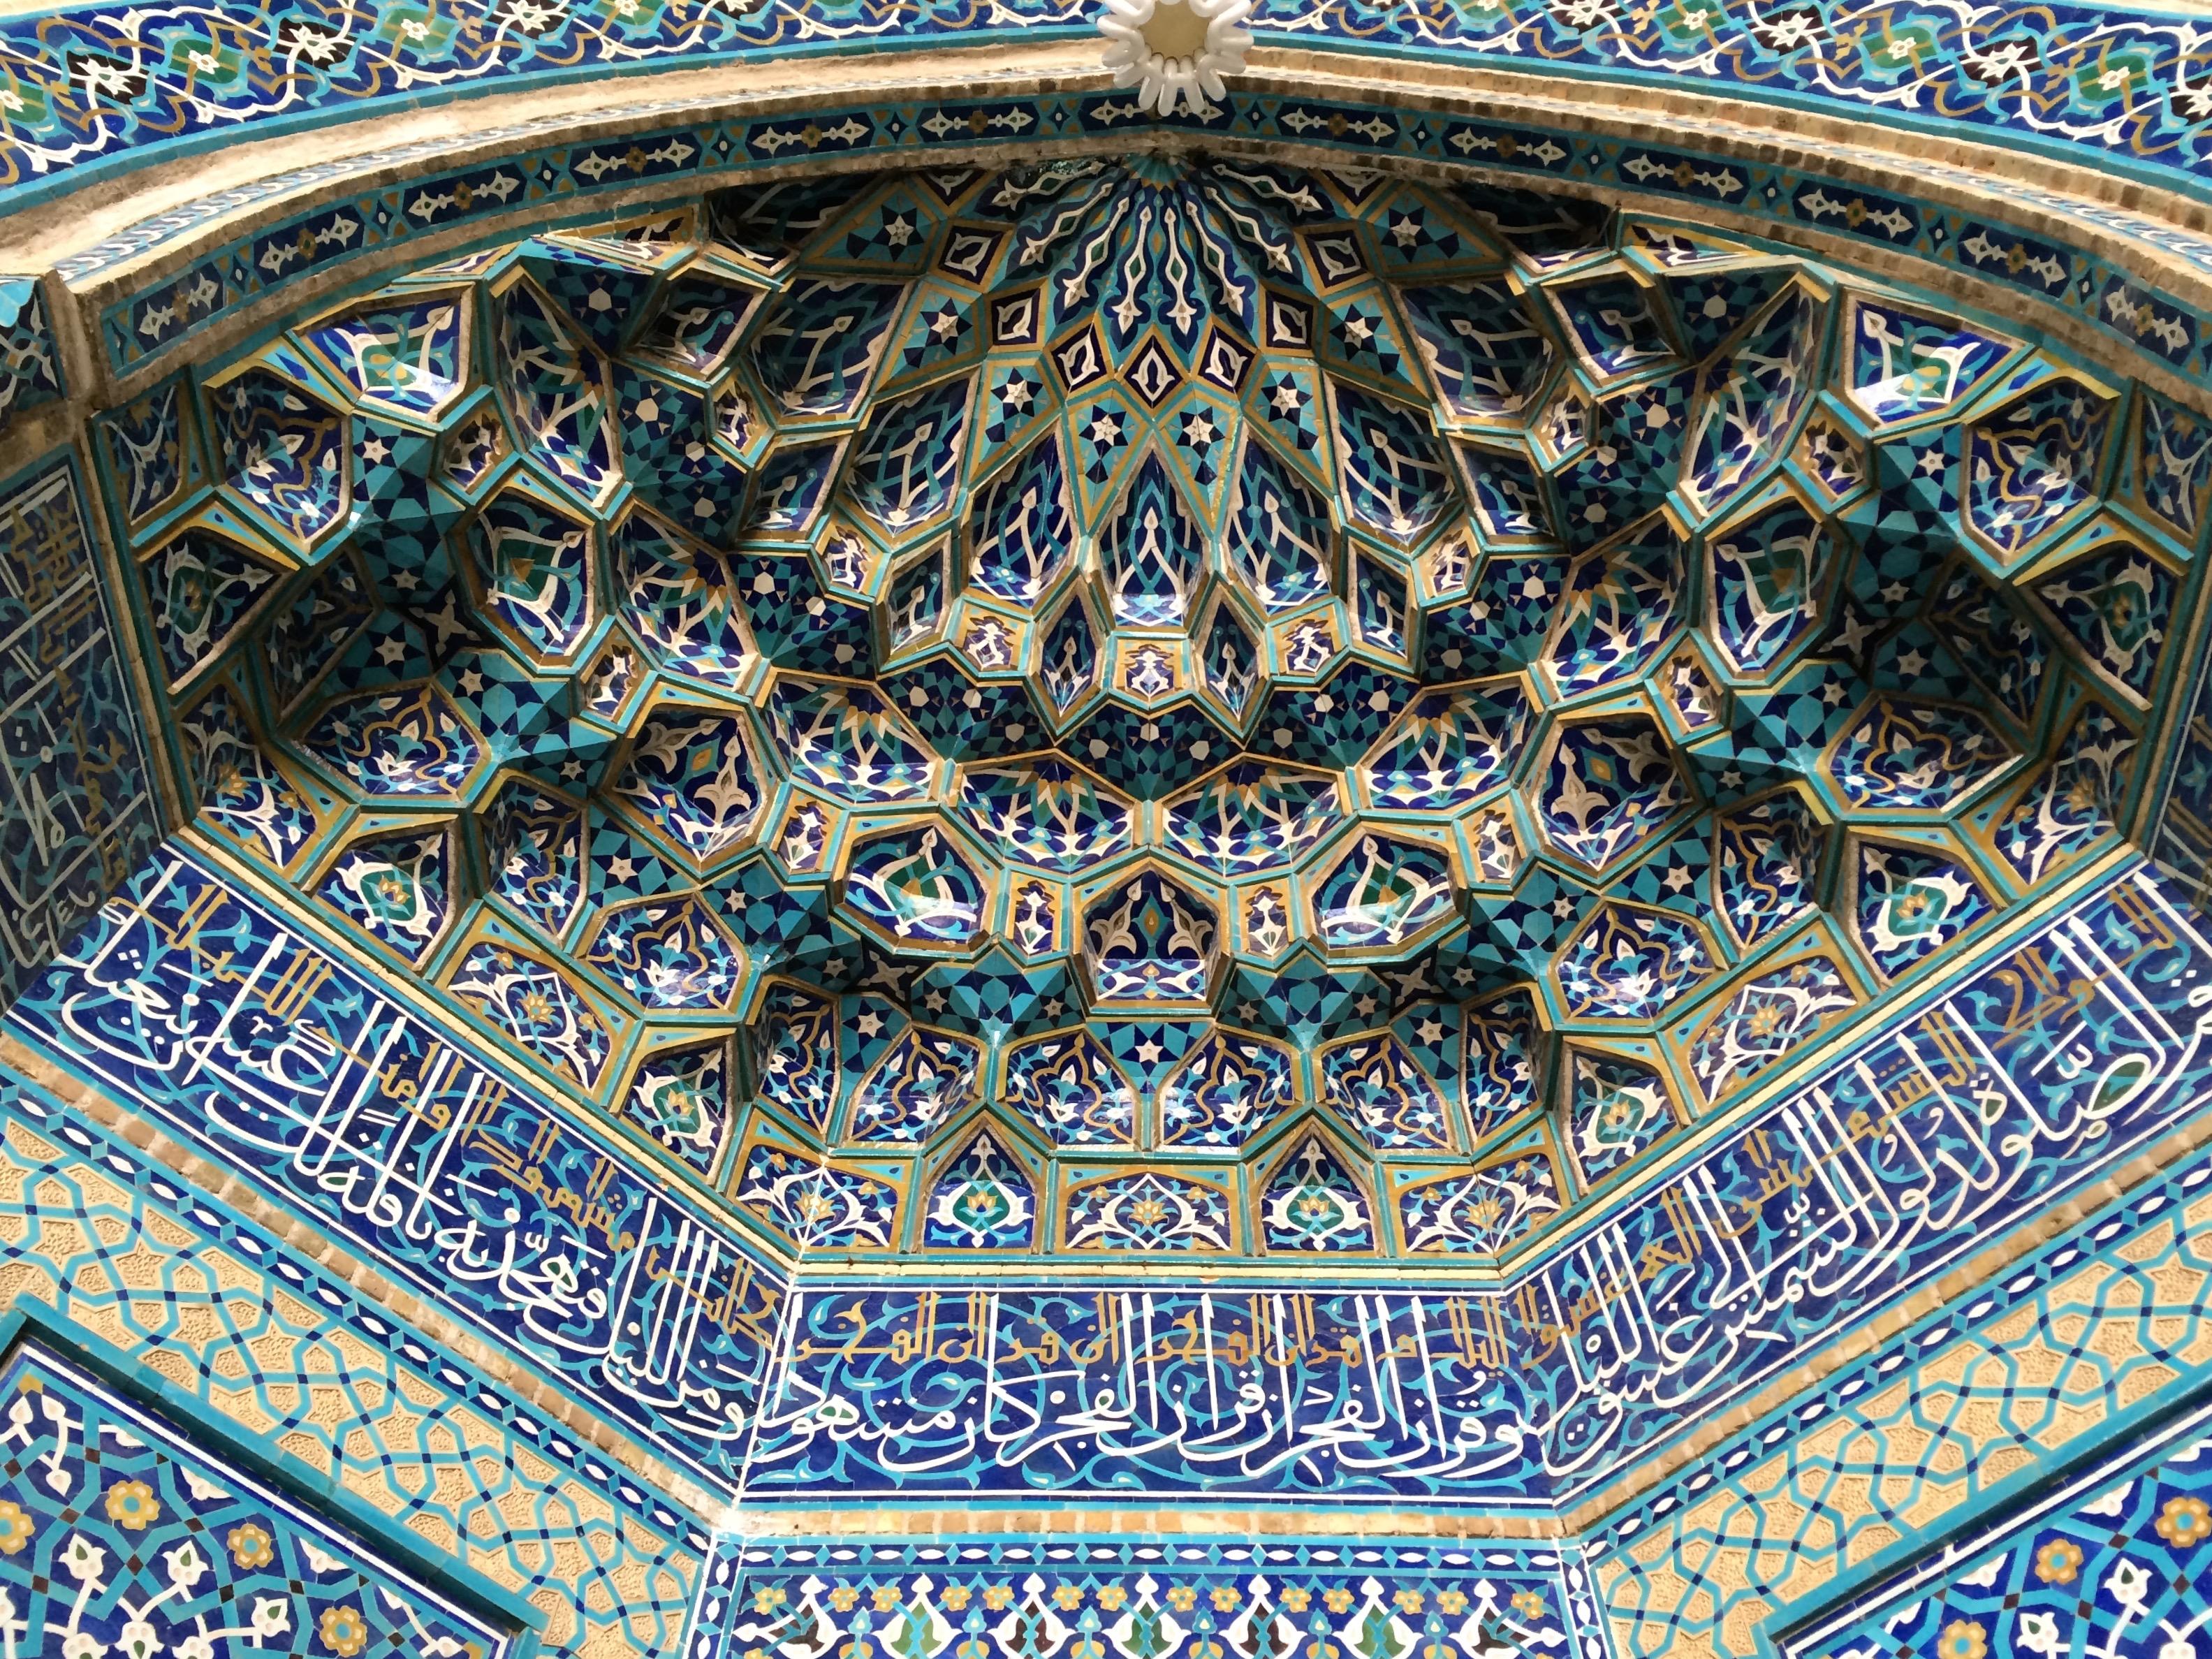 Heirloom Tech: The Math and Magic of Muqarnas